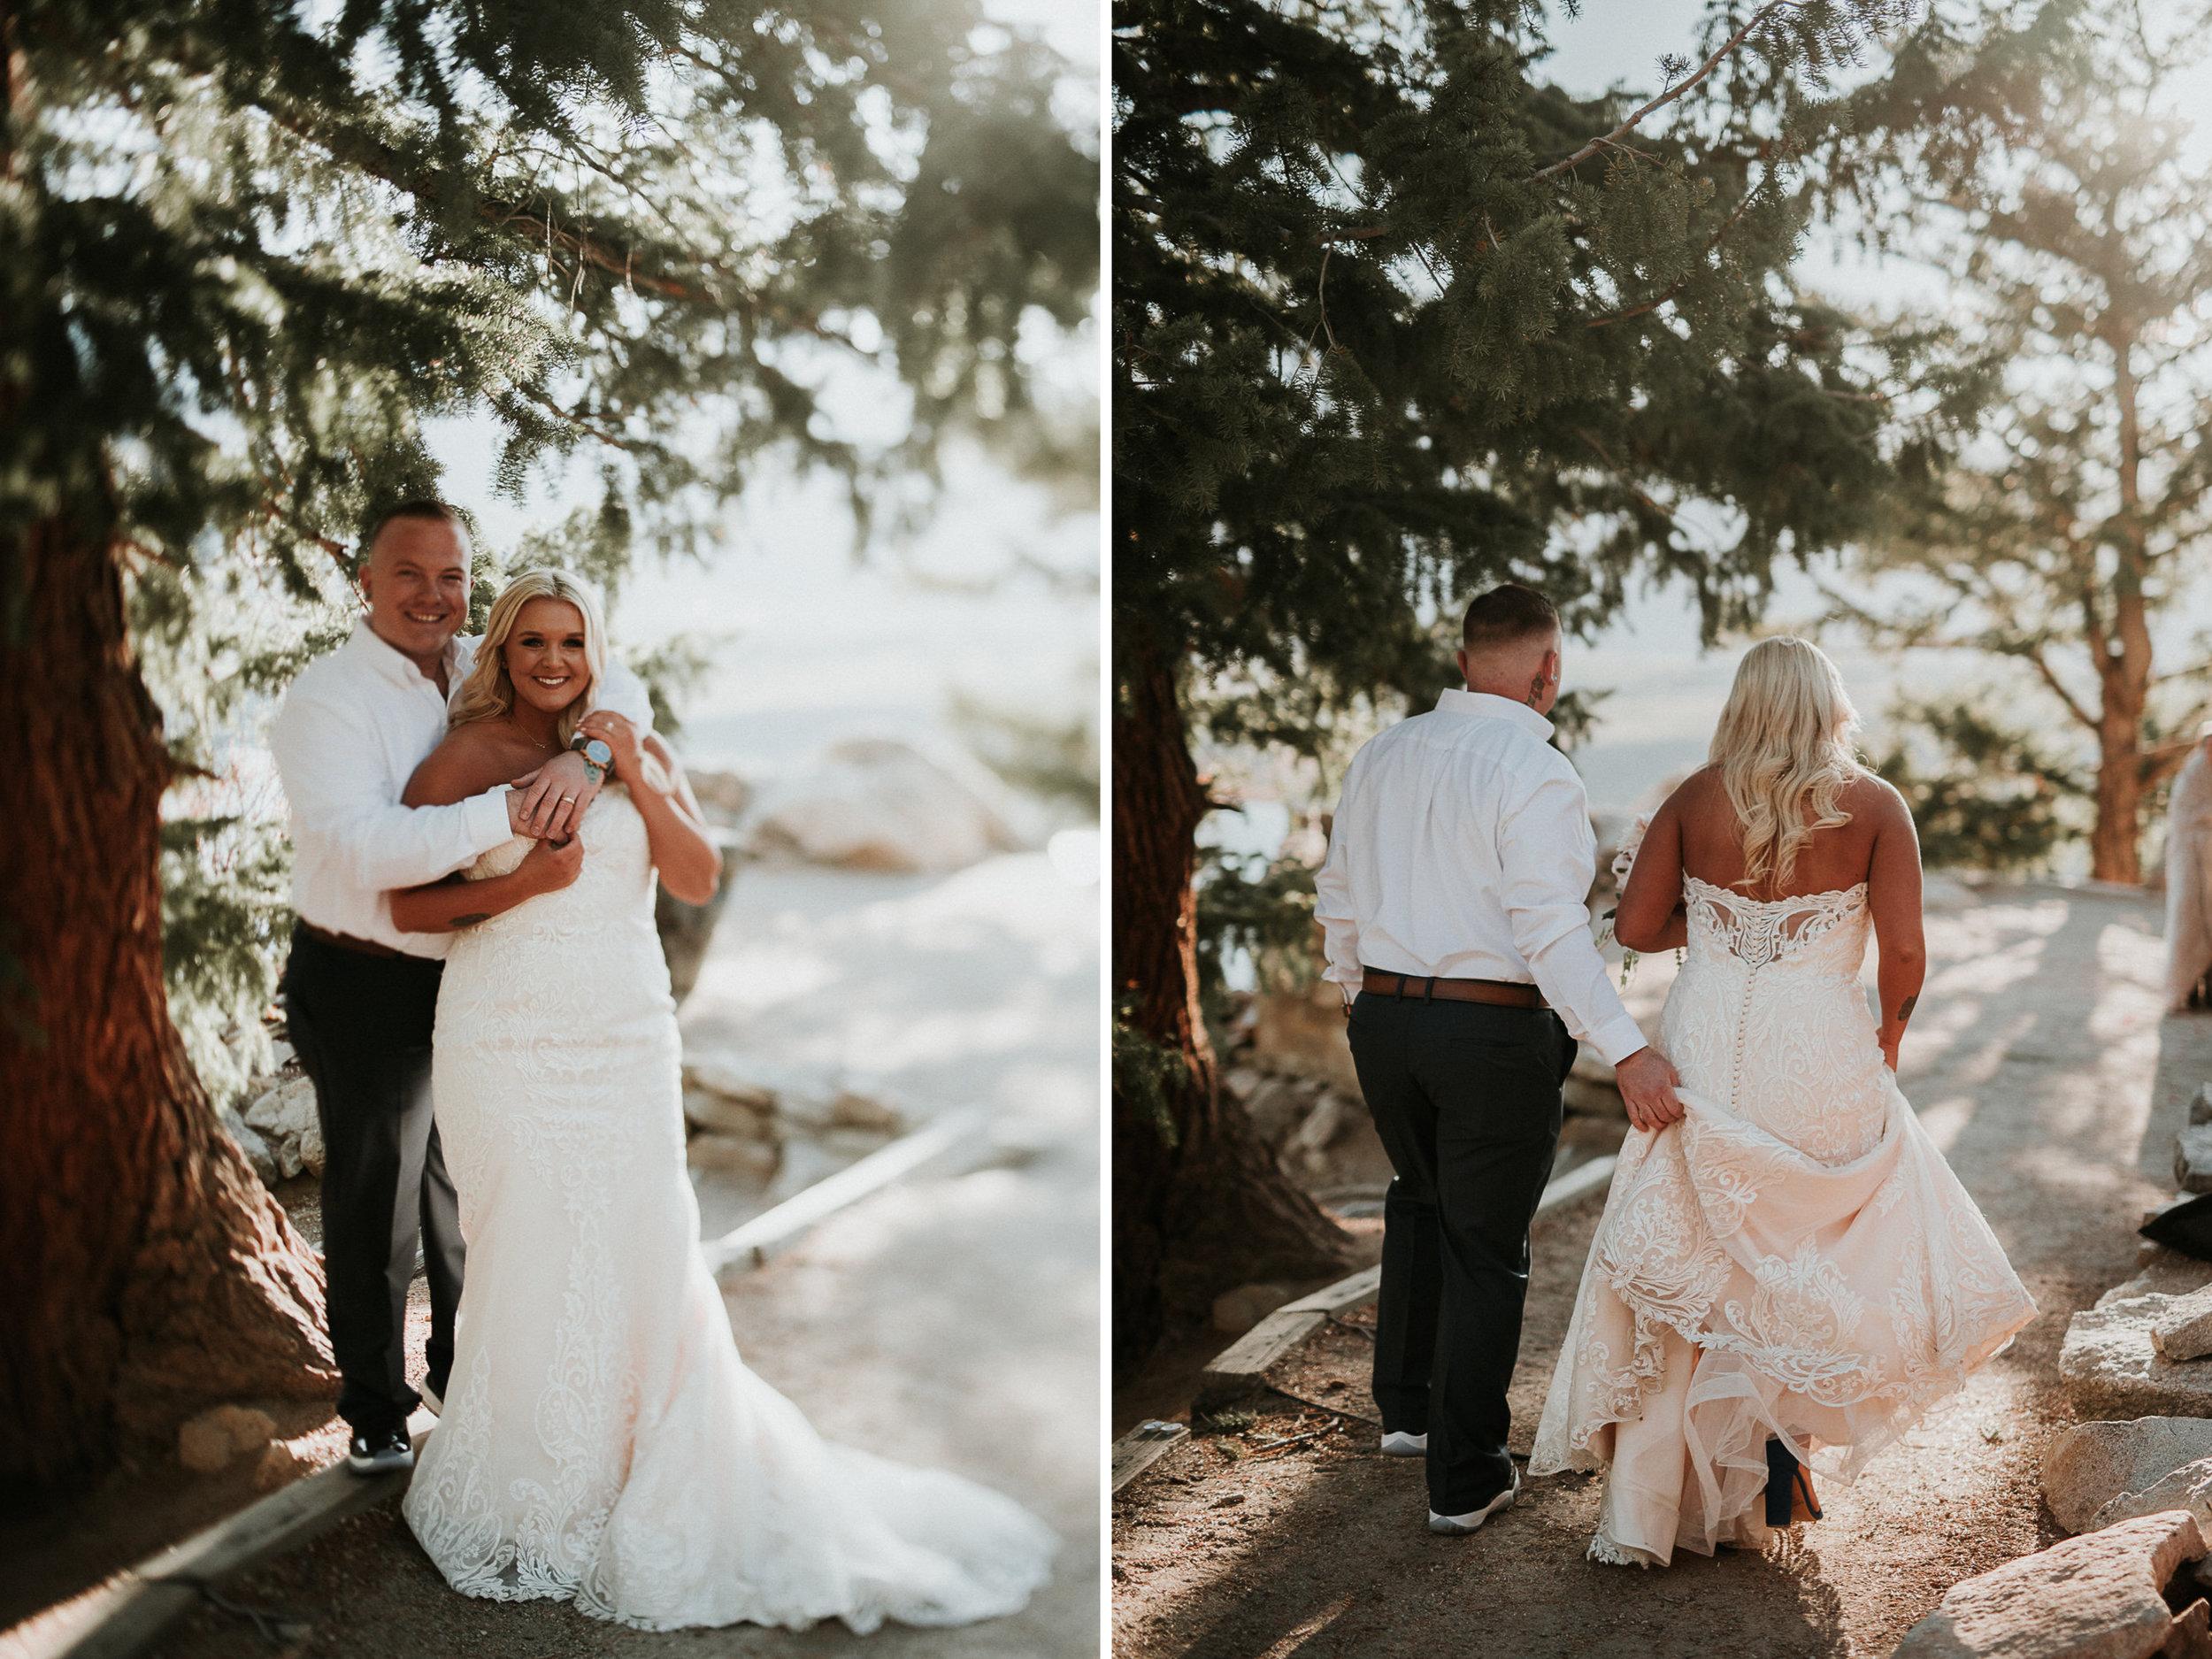 st. louis wedding photographer Zach&Rosalie - Lake Dillon CO Elopement 7.5.jpg